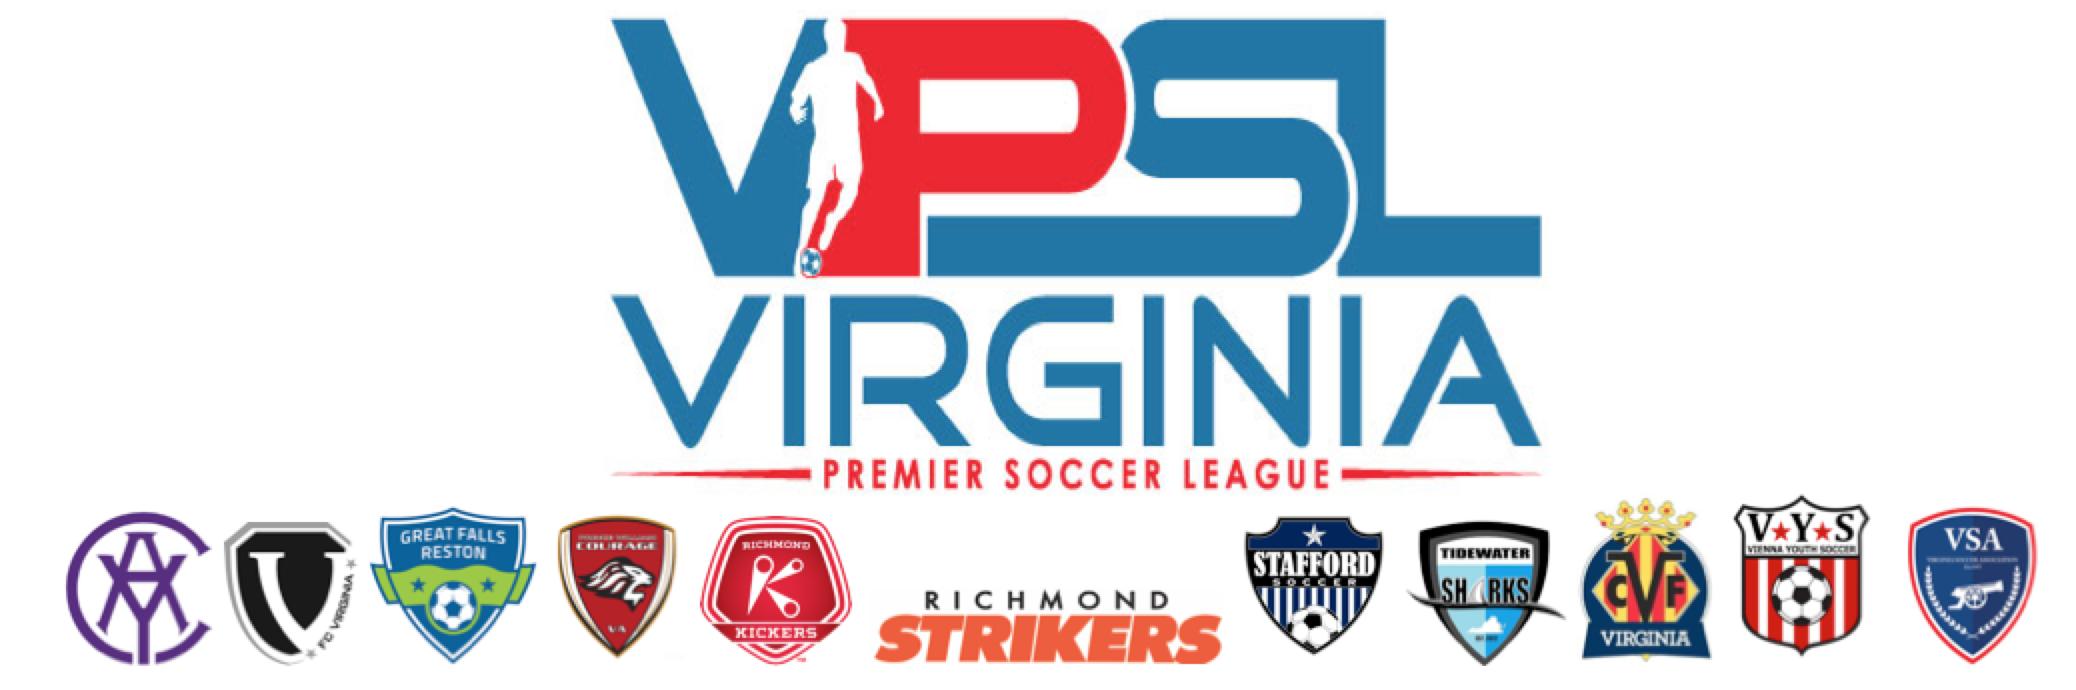 Gs league logo 2019 20